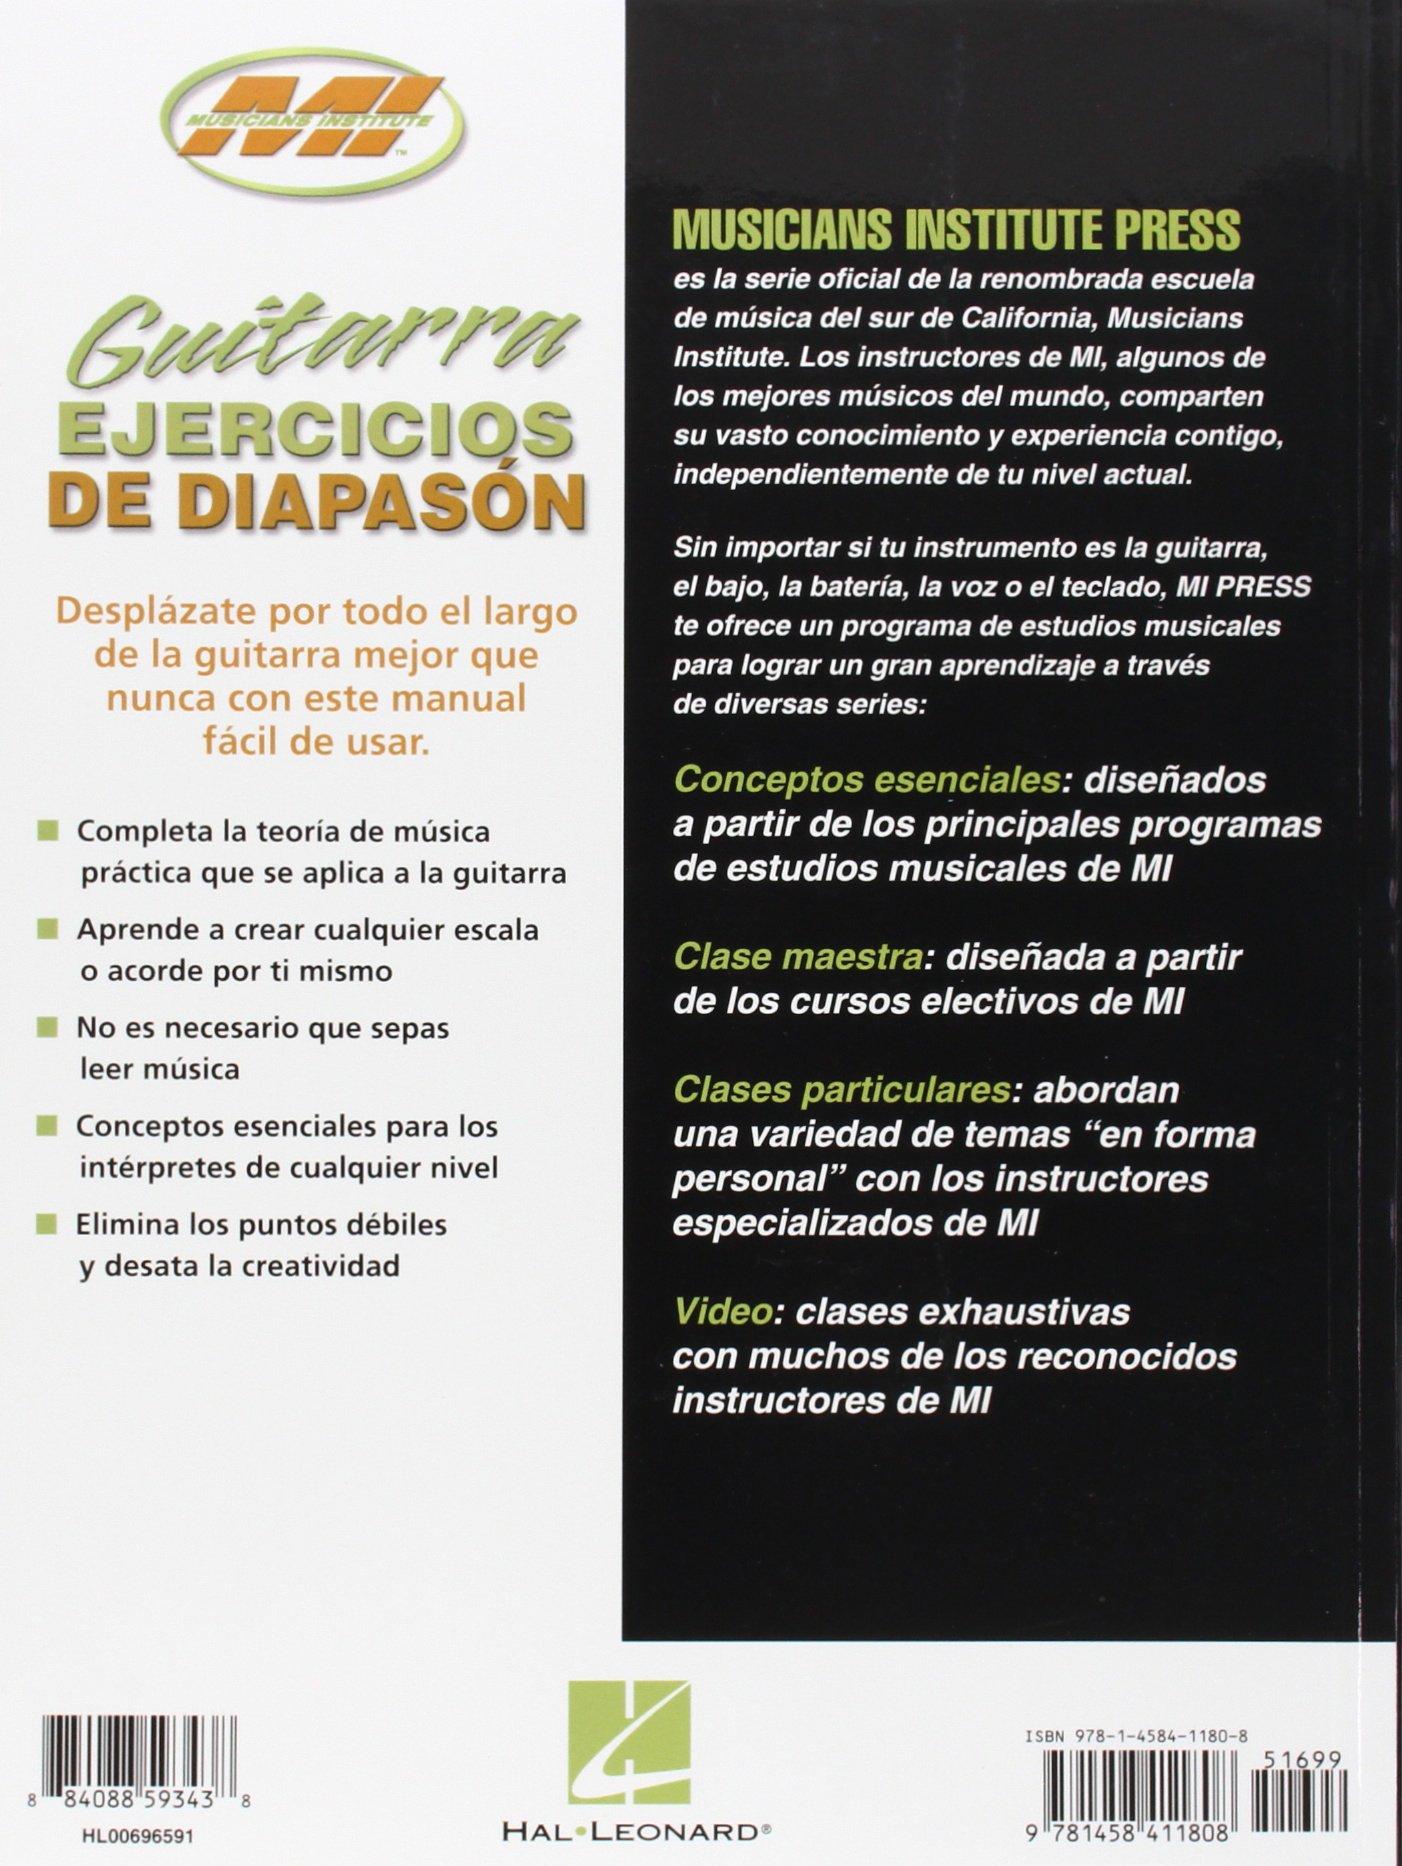 Guitarra Ejercicios de Diapason: Conceptos Esenciales: Barrett Tagliarino: 0884088593438: Amazon.com: Books